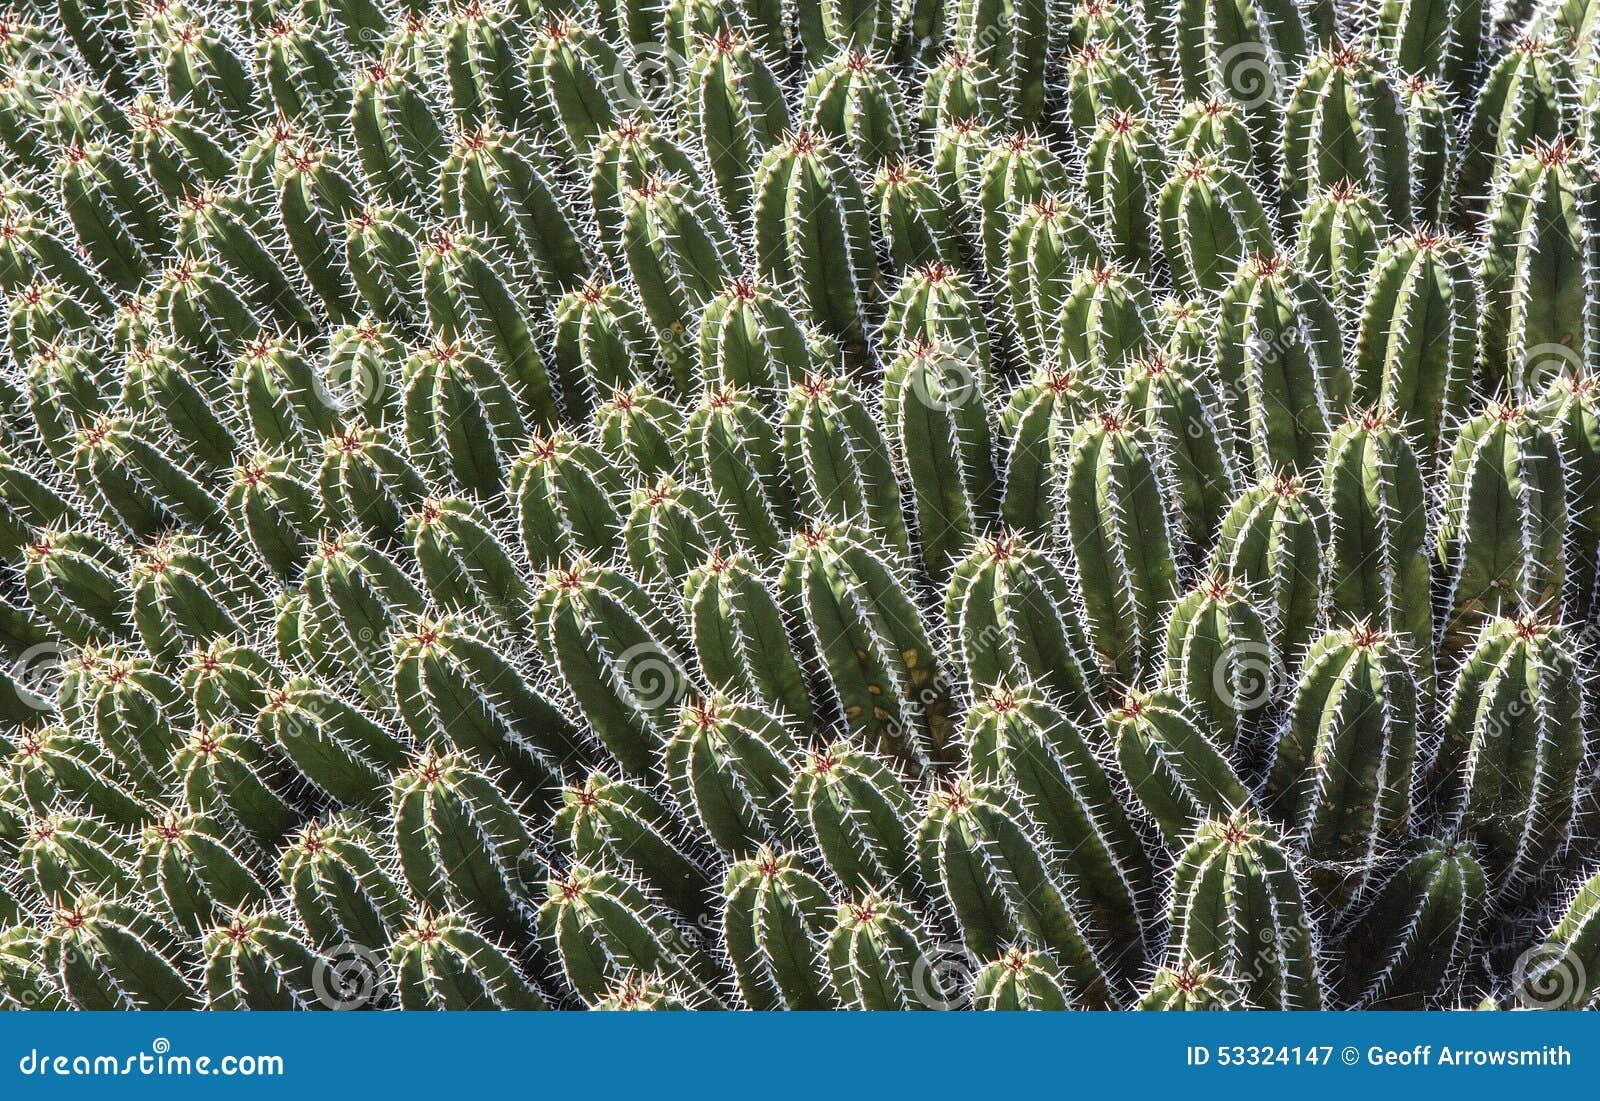 Baby cacti at jardin de cactus stock image image 53324147 for Jardines con cactus